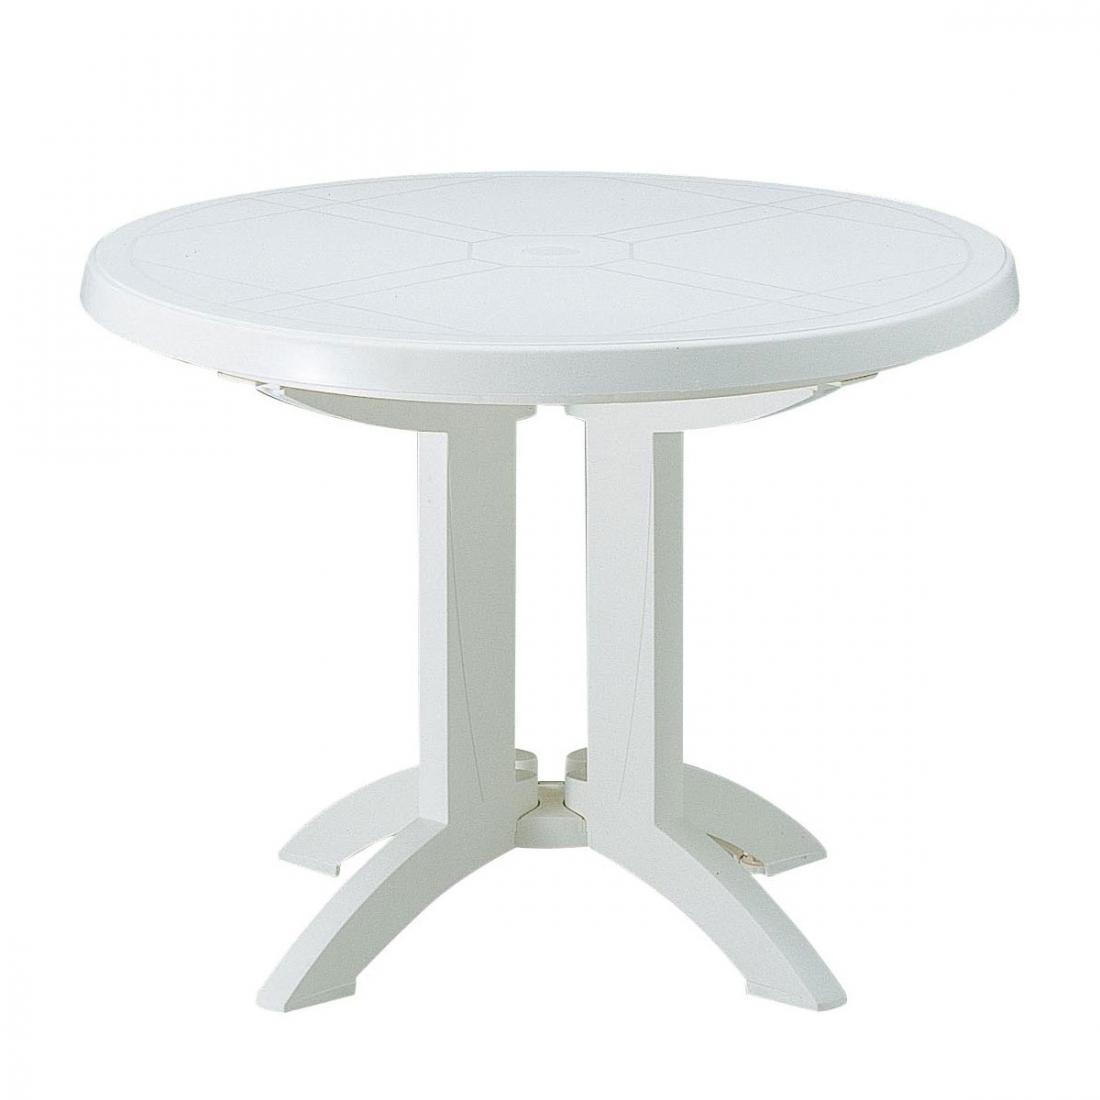 Table Ronde Jardin Table Ronde De Jardin Vega Grosfillex Idees